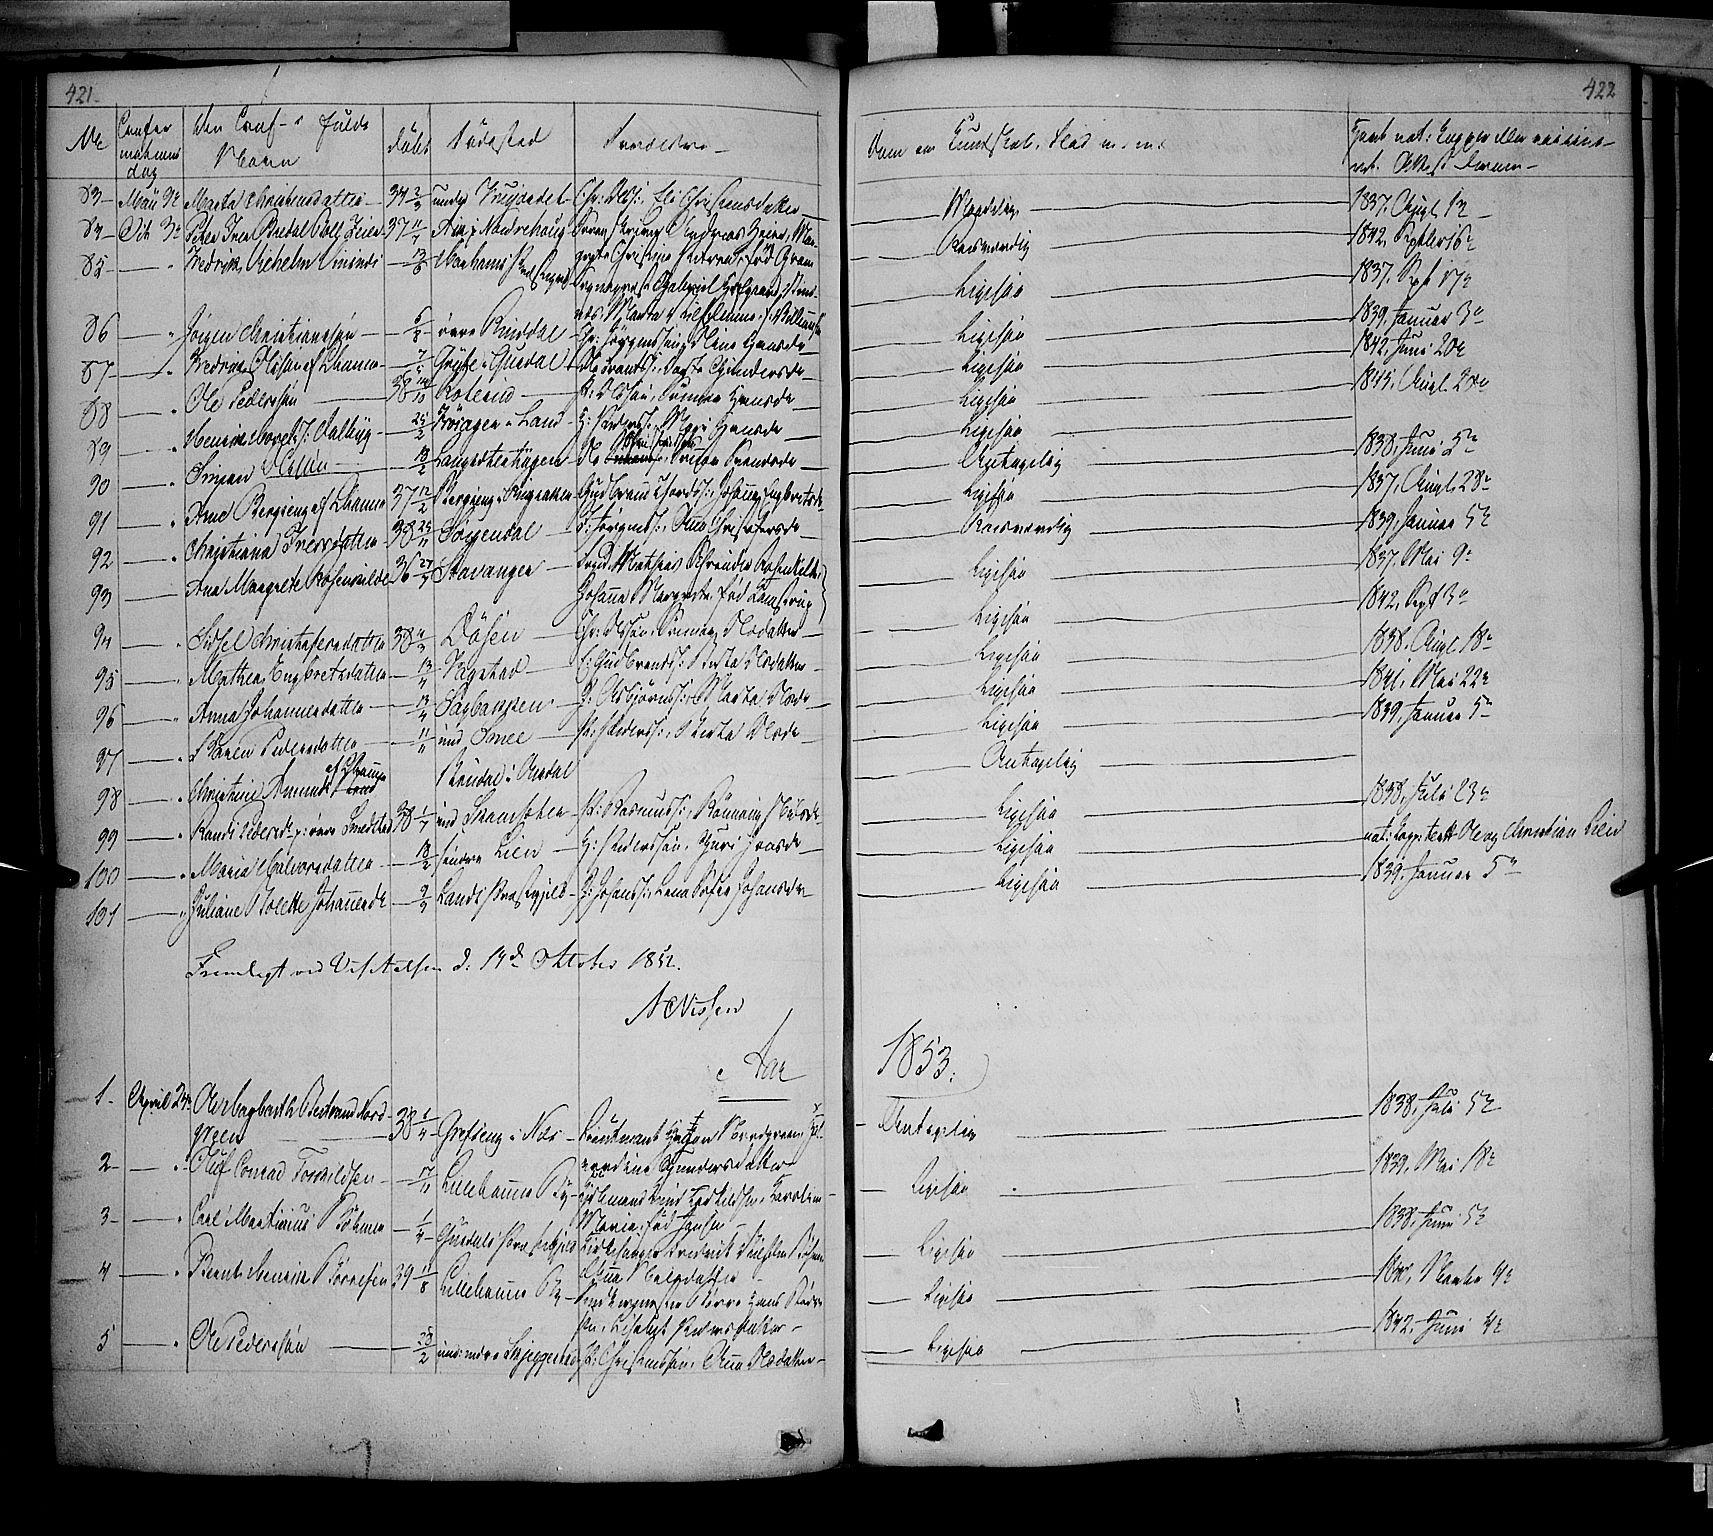 SAH, Fåberg prestekontor, Ministerialbok nr. 5, 1836-1854, s. 421-422